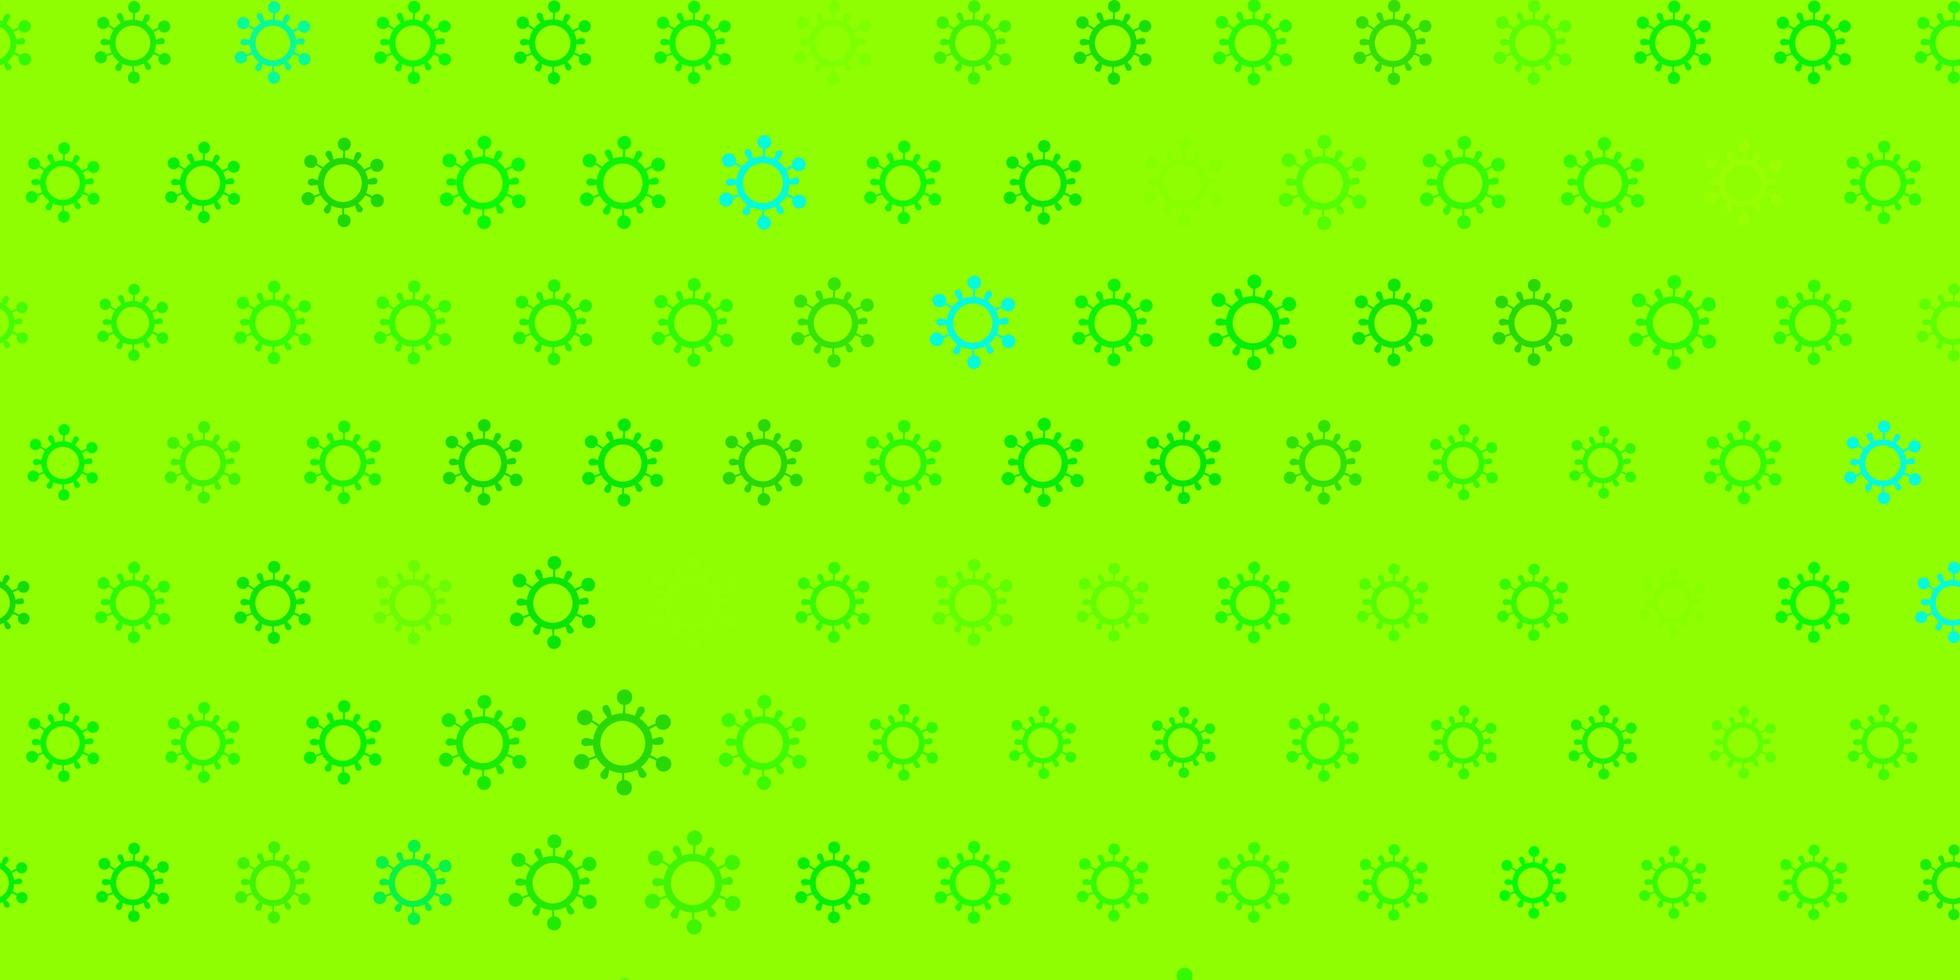 Light green texture with disease symbols. vector